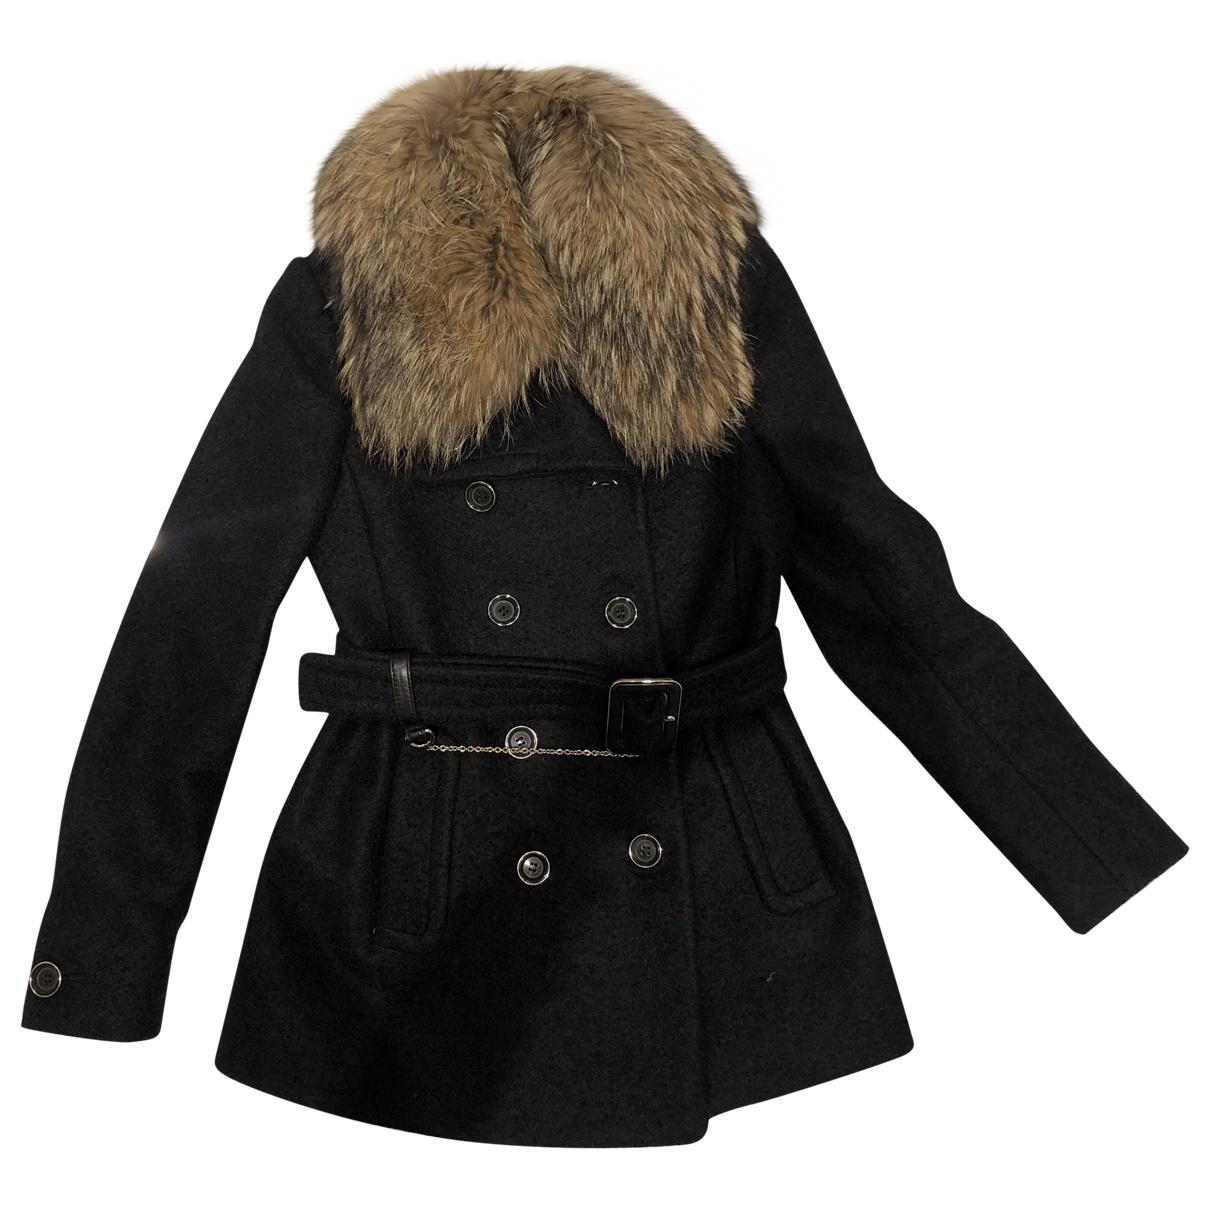 Gucci \N Black Fur coat for Women 38 IT